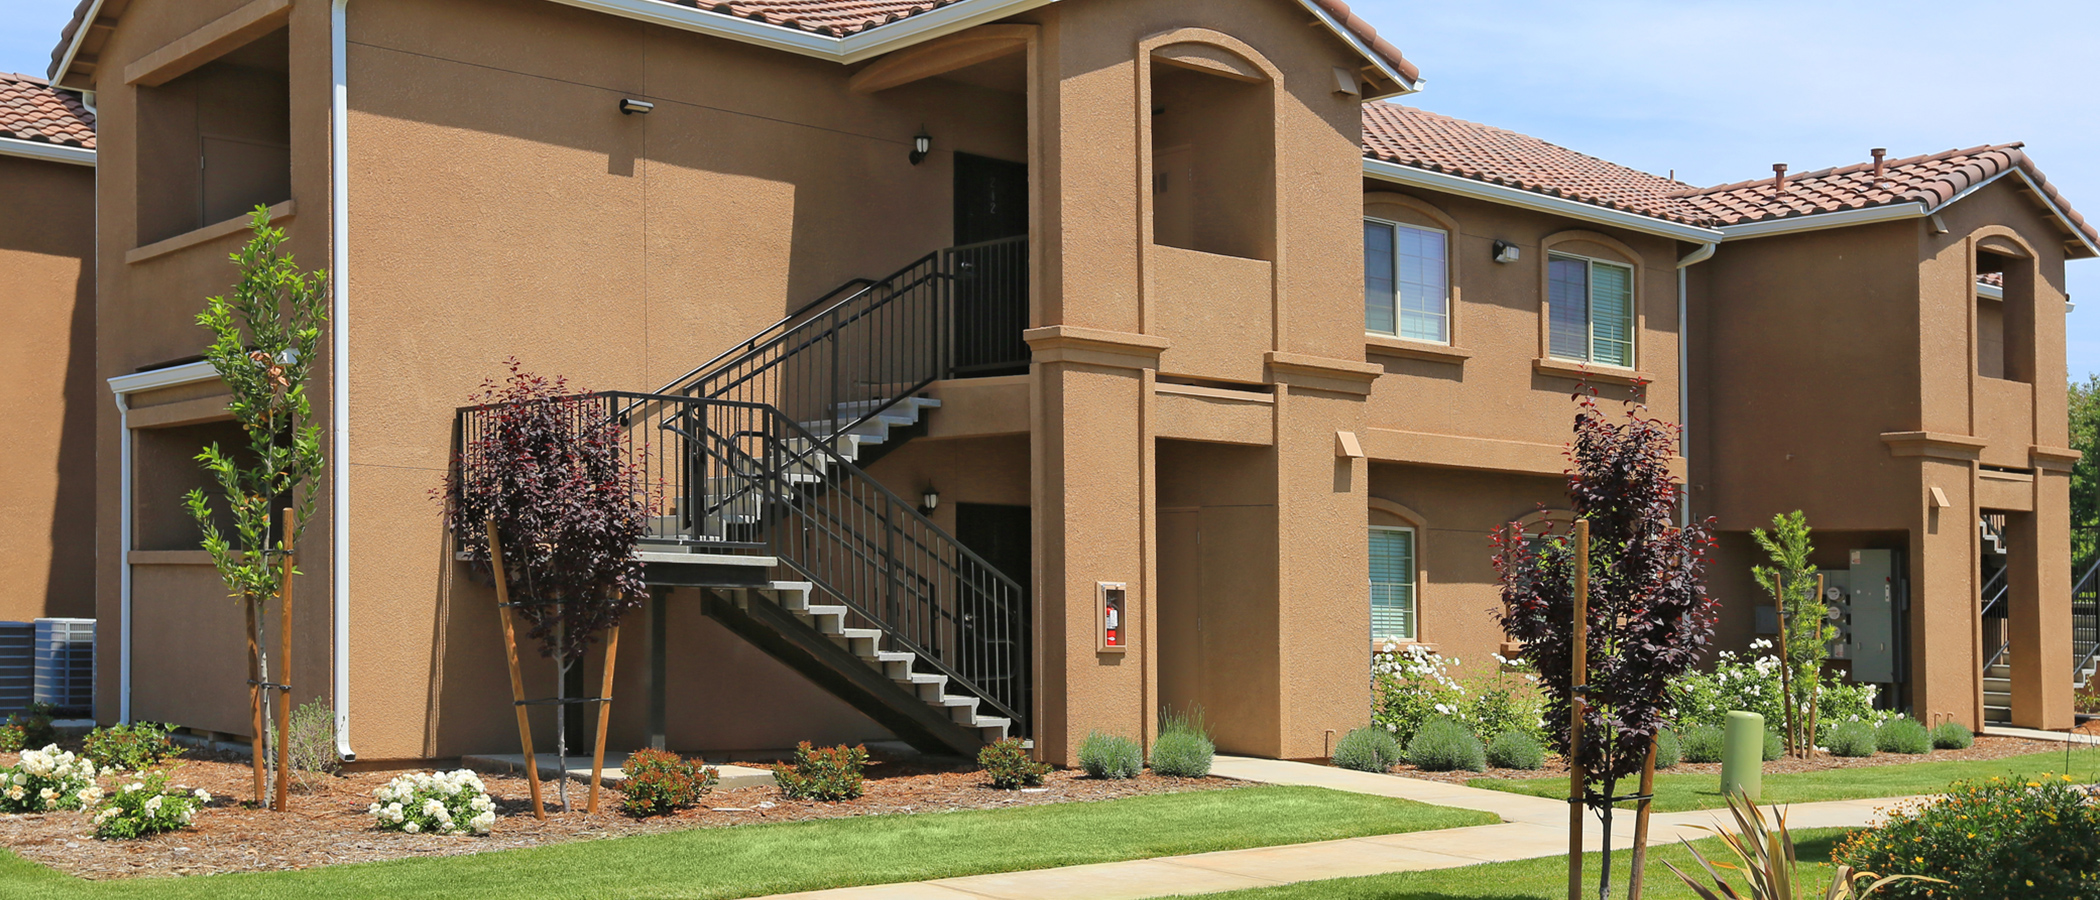 Greystone - Apartments in Fresno, CA